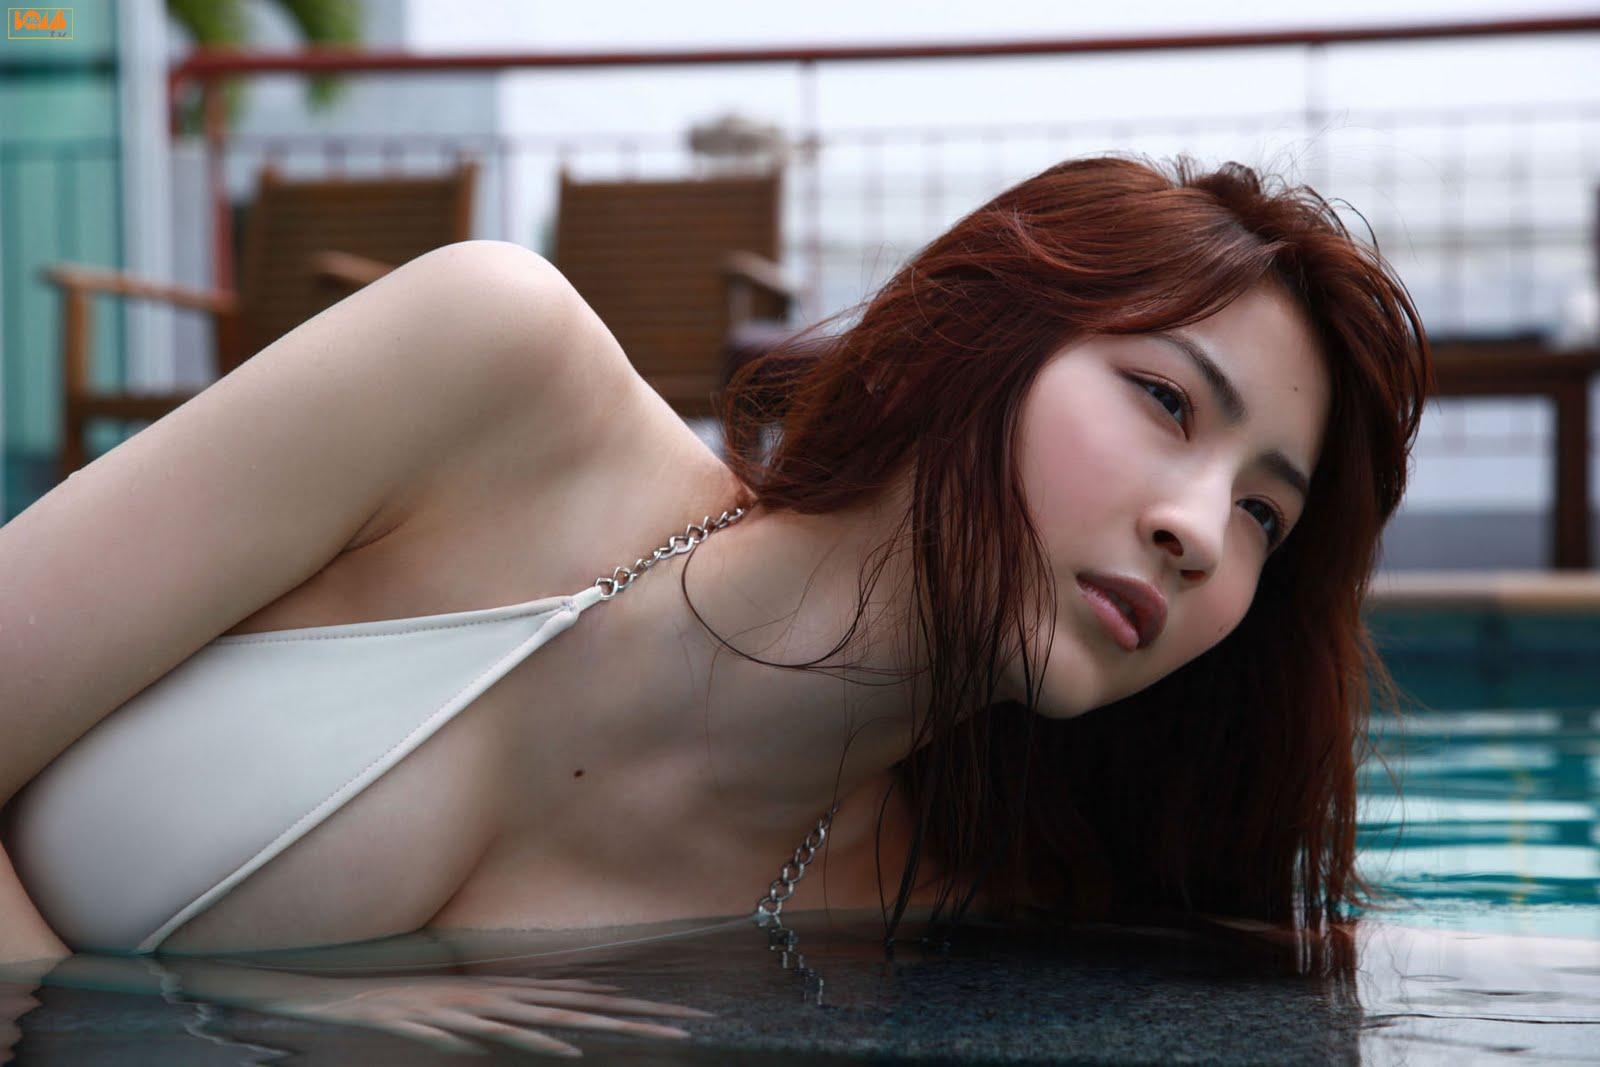 http://1.bp.blogspot.com/-CBs5AsuNpXk/TkEcKC_WvVI/AAAAAAAAGYI/5Y2b0VwL4Sk/s1600/asana-mamoru33.jpg